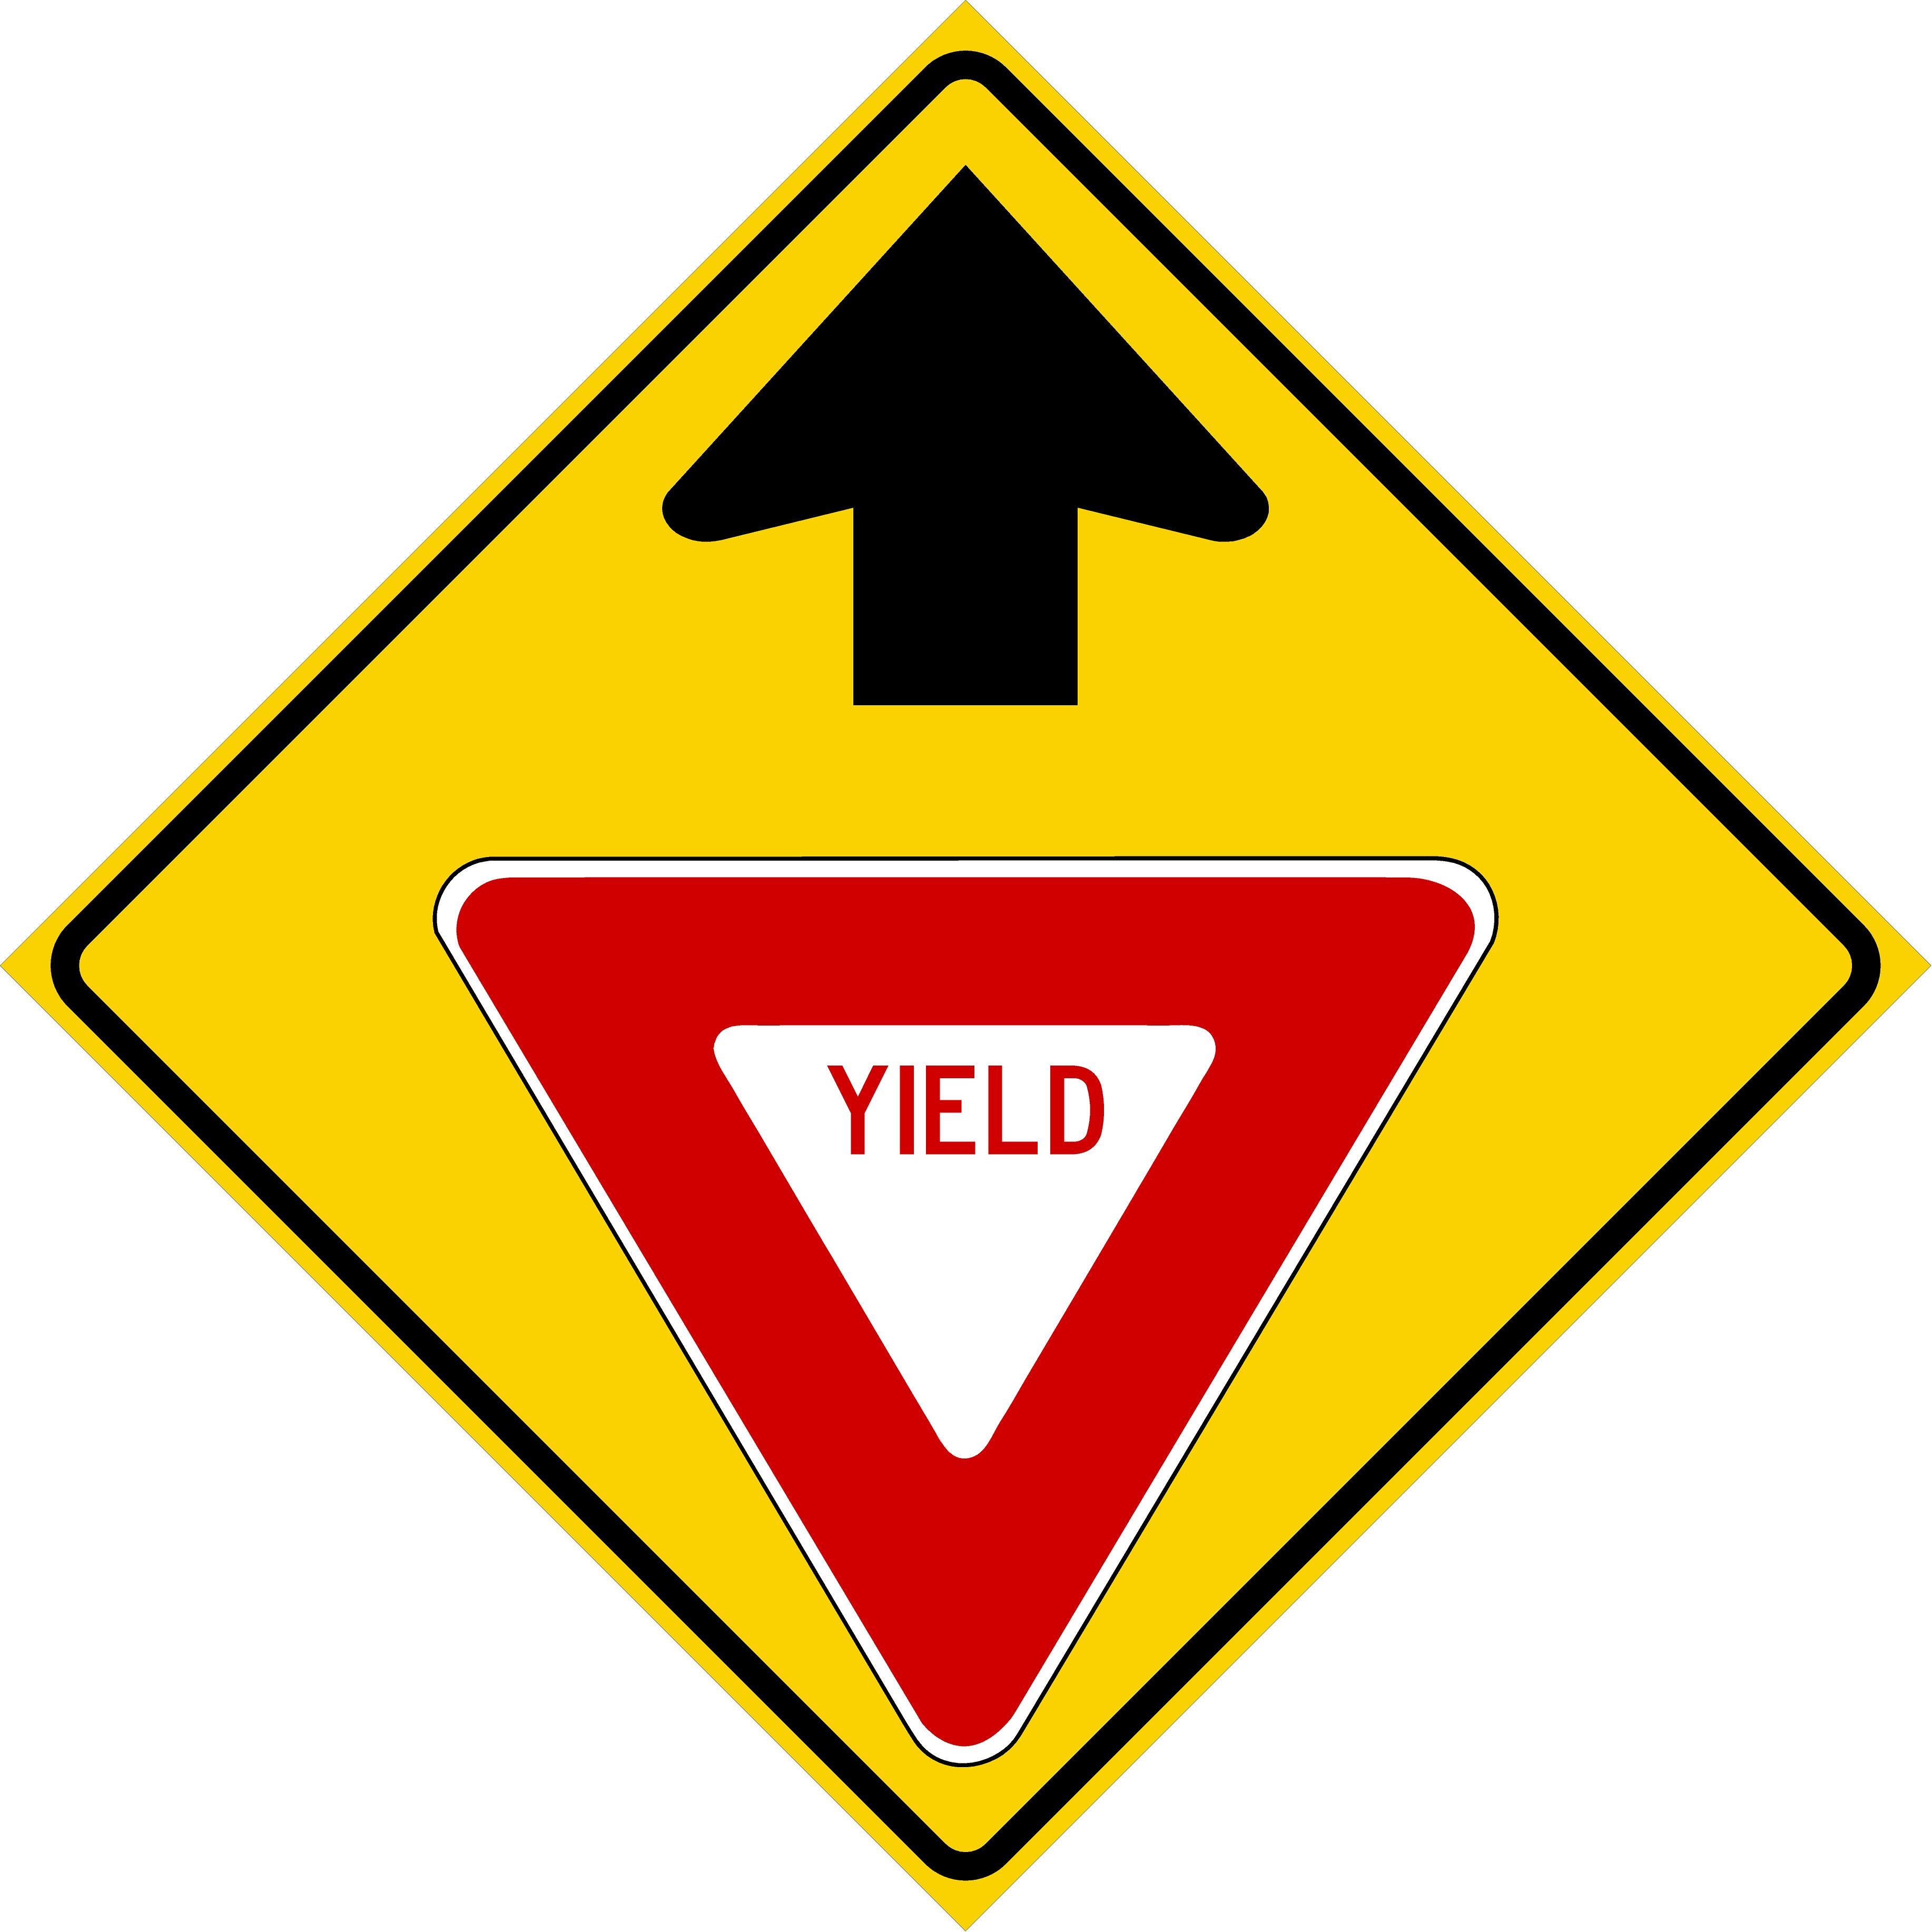 Yield Ahead (W3-2)